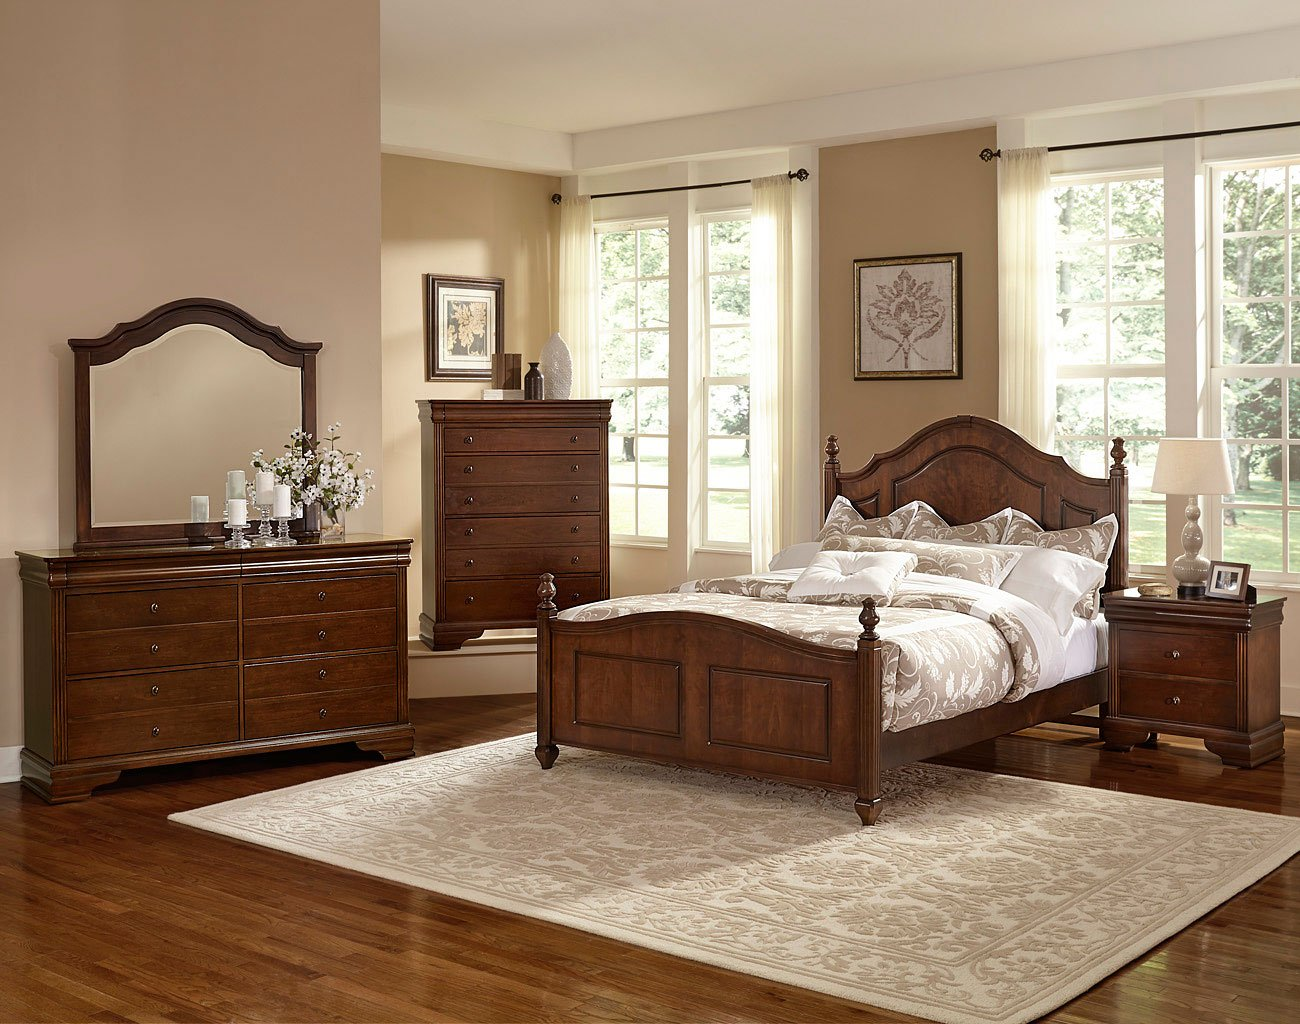 french market poster bedroom set (french cherry) vaughan bassett | furniture cart